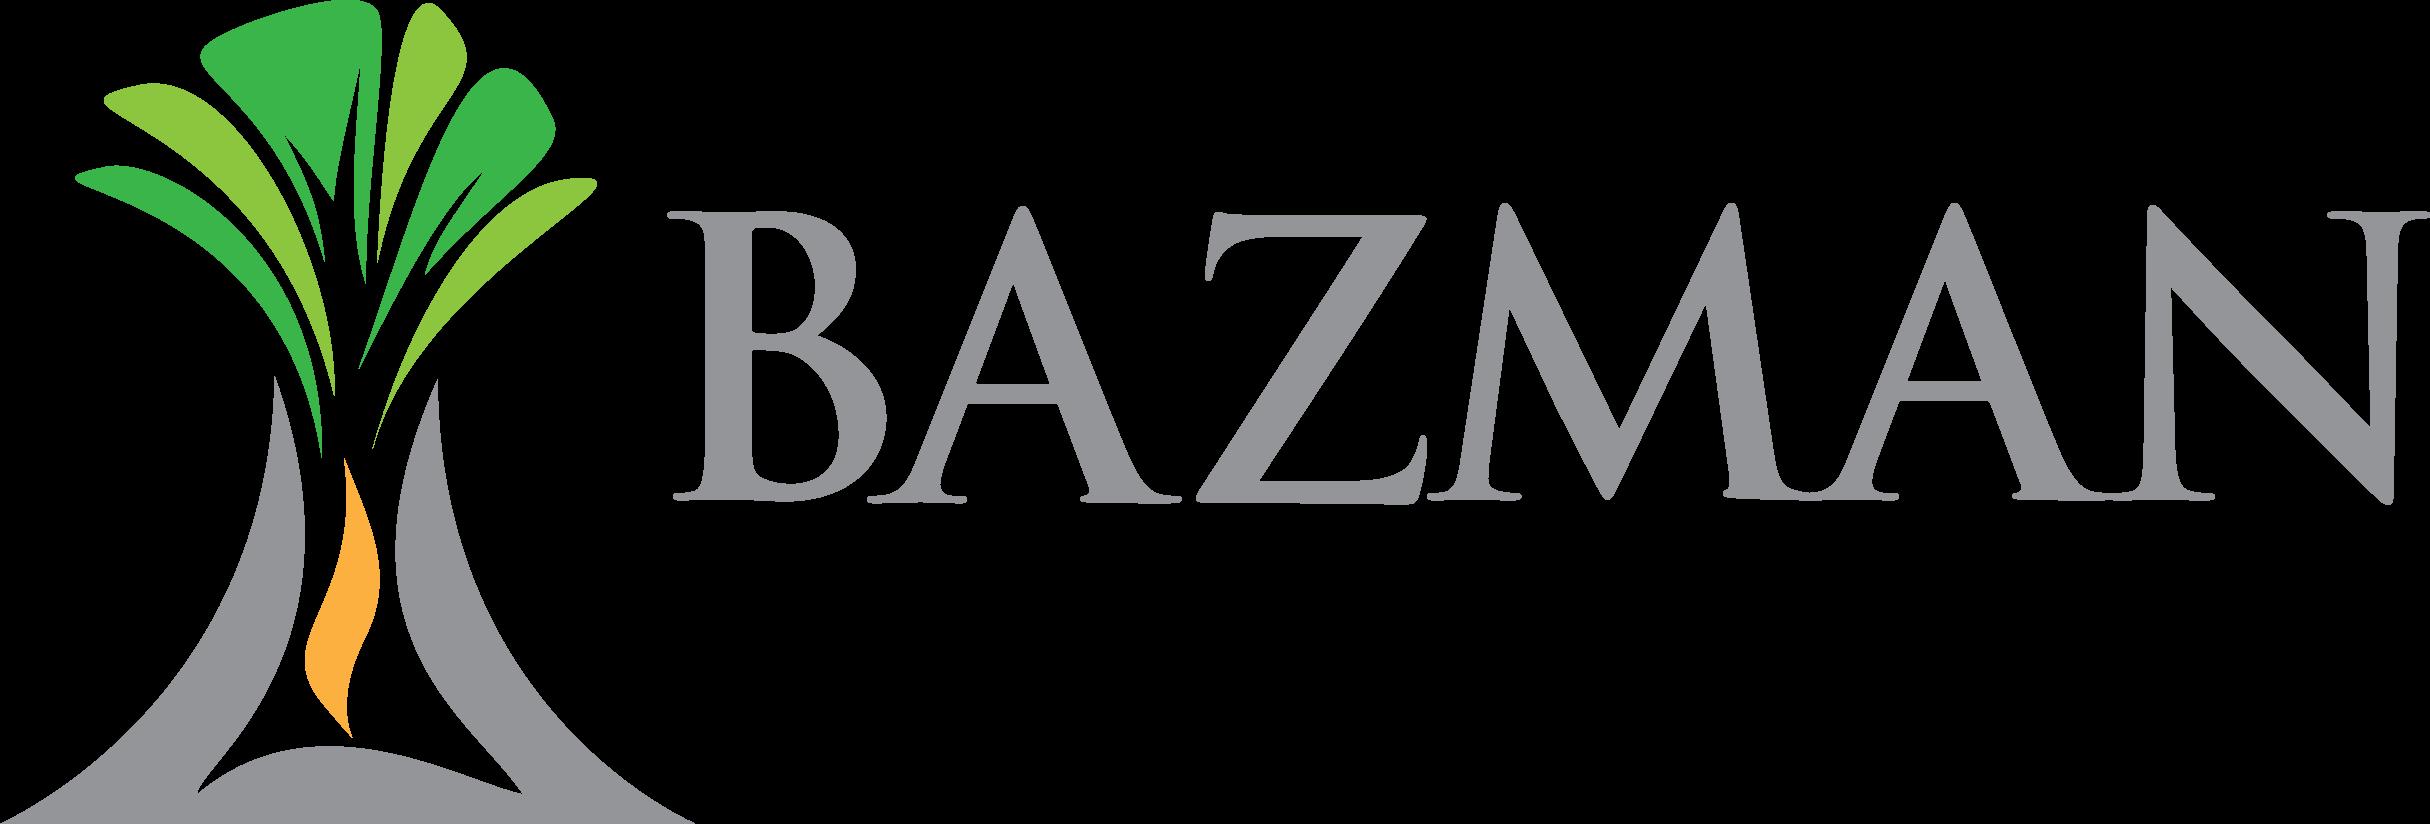 Bazman Products